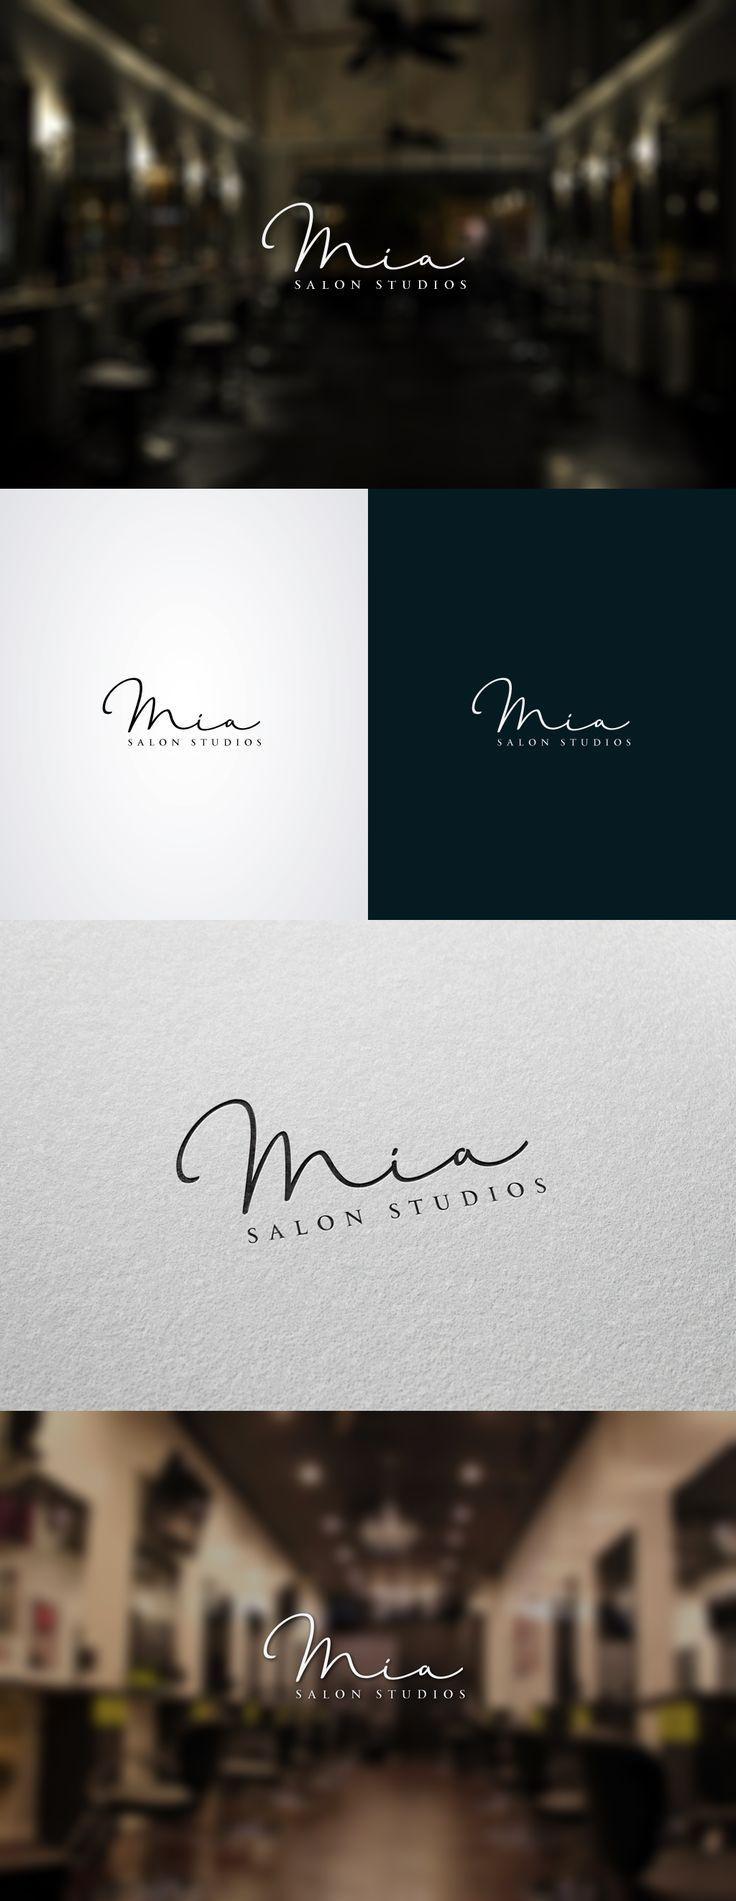 New salon studios startup needs a logo!                                                                                                                                                      More Nail Design, Nail Art, Nail Salon, Irvine, Newport Beach